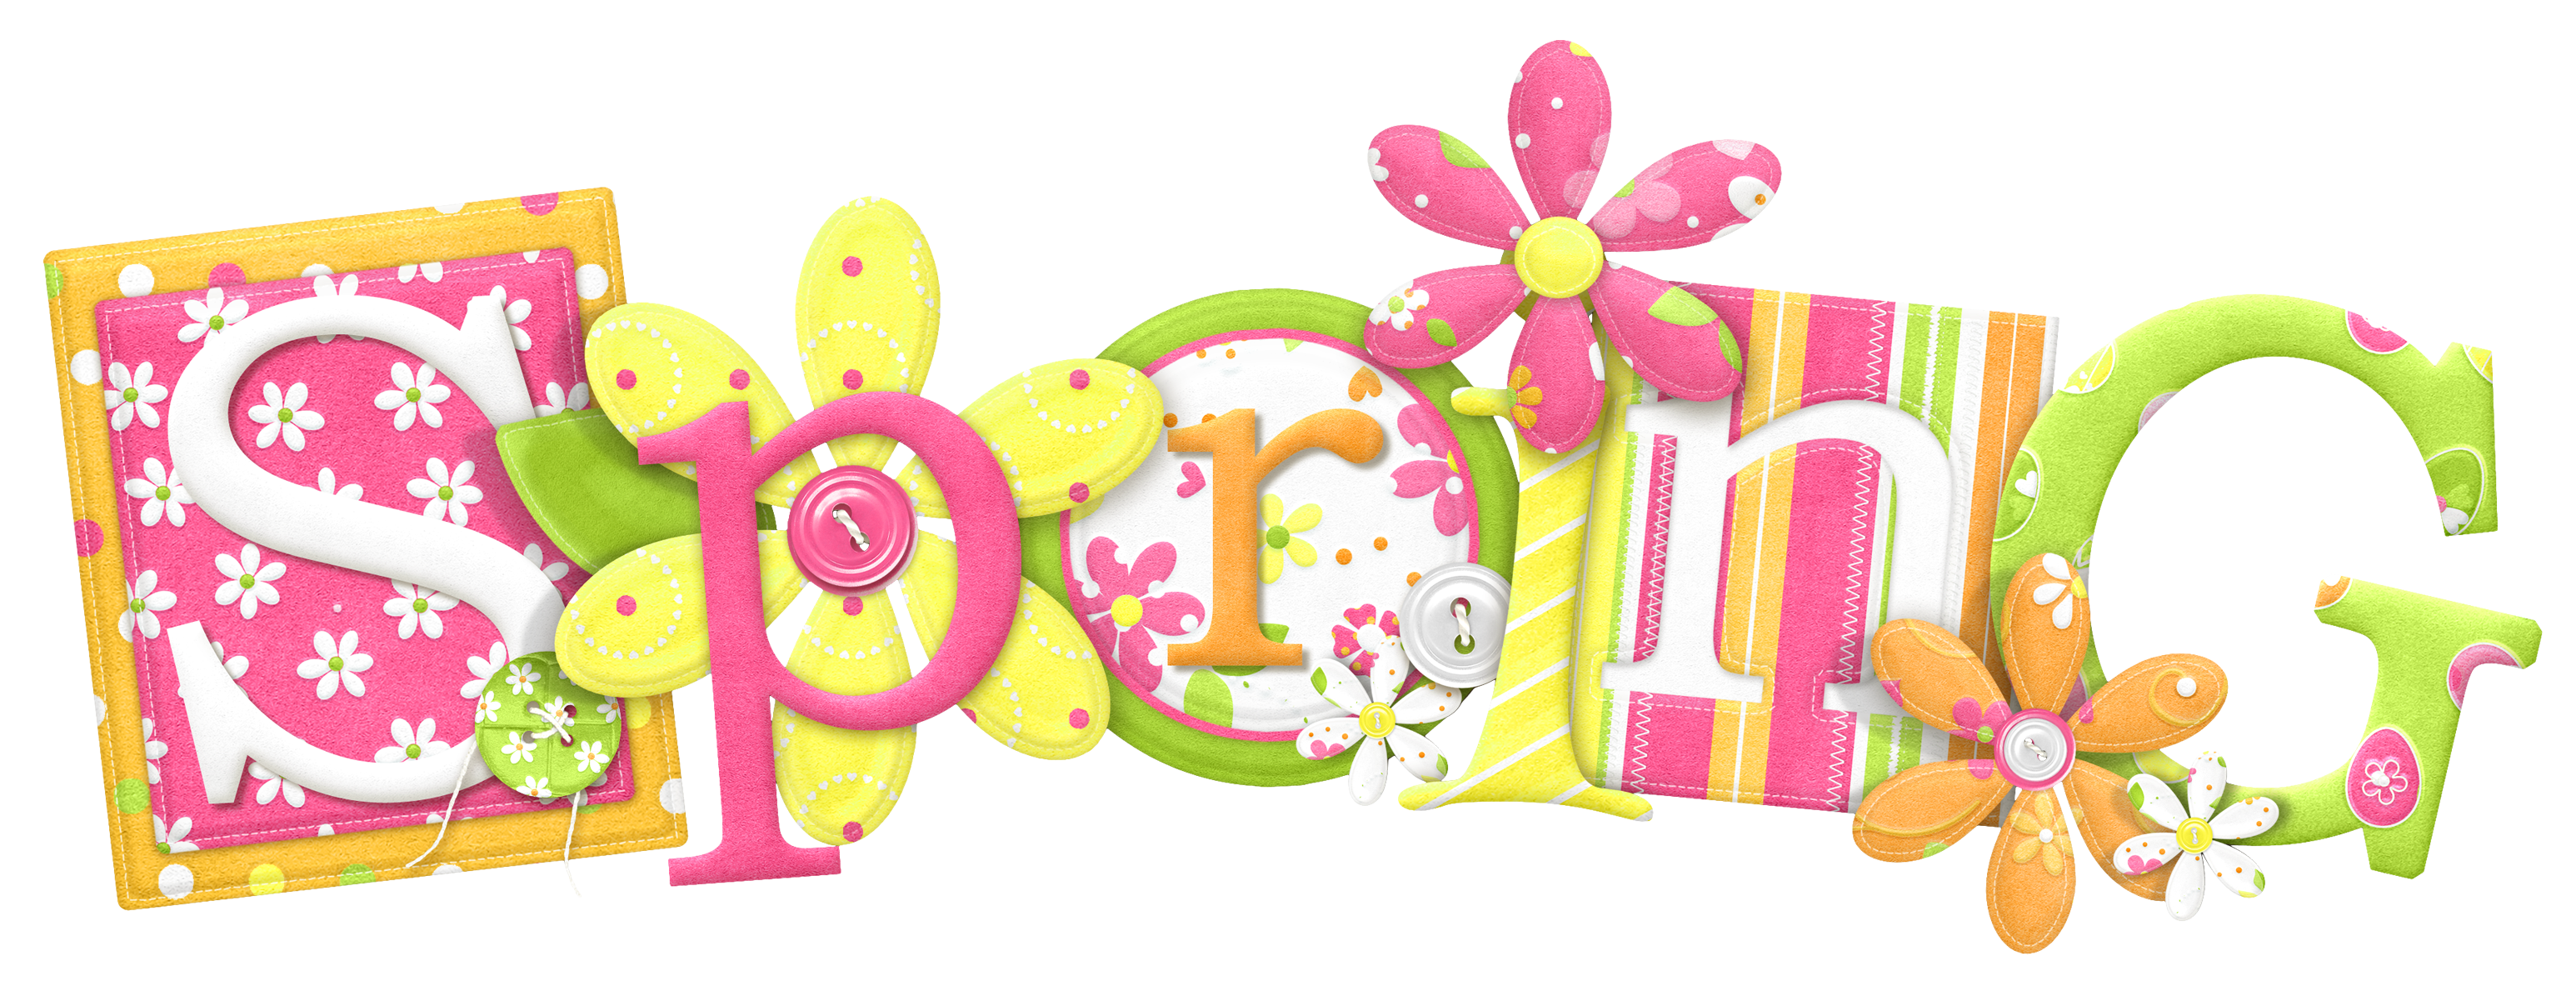 Spring Clip Art Free Clipart Image 2-Spring clip art free clipart image 2-15